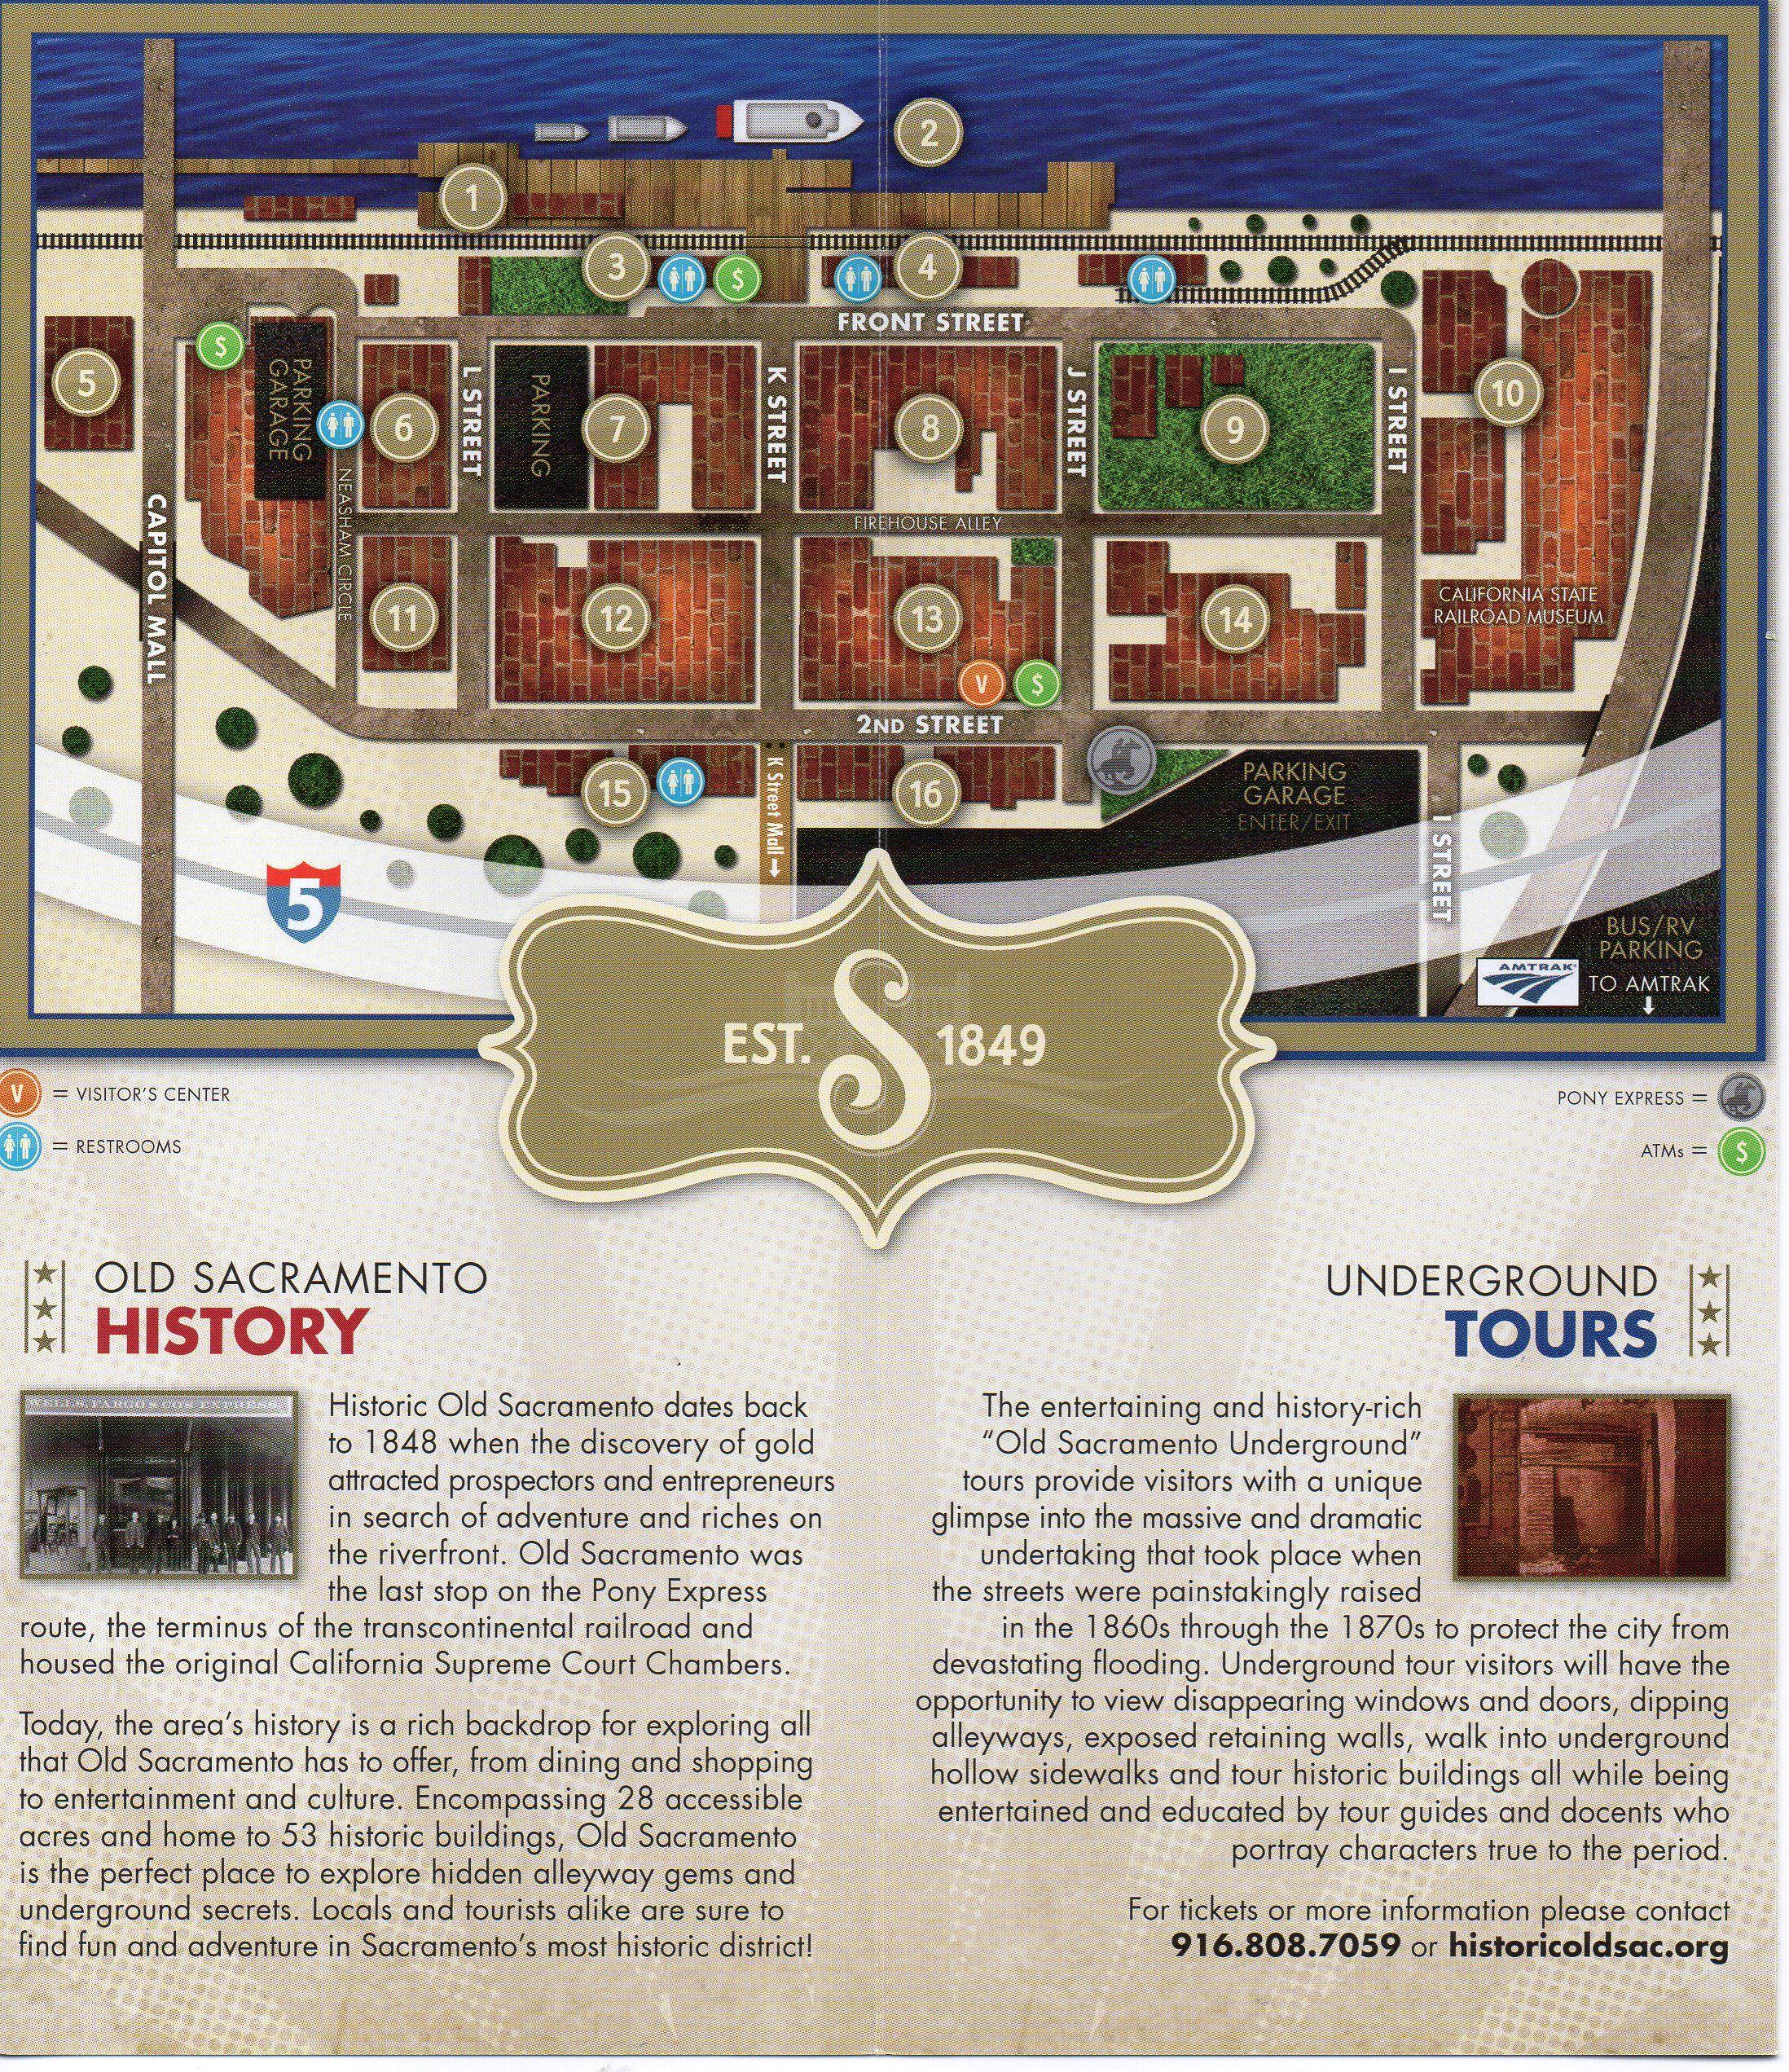 Old Sacramento Brochure and Map Old Sacramento State Park Pinterest